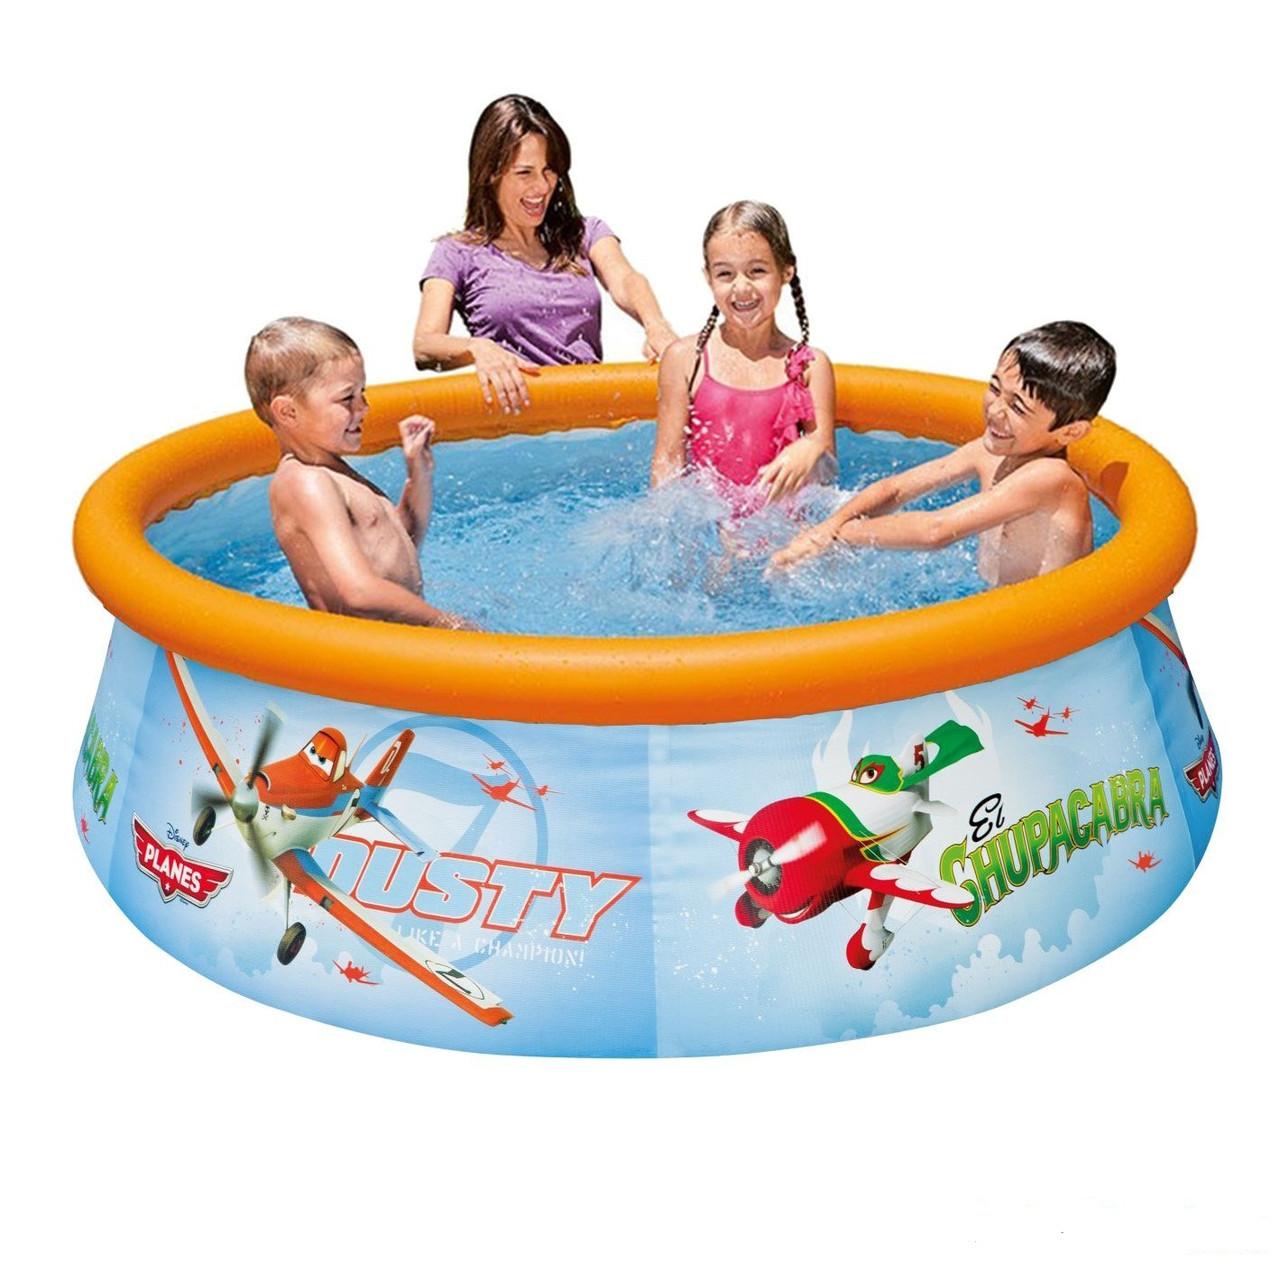 Надувной бассейн басейн Intex 28102. 183 х 145 х 51 см Семейный Easy Басейн круглый